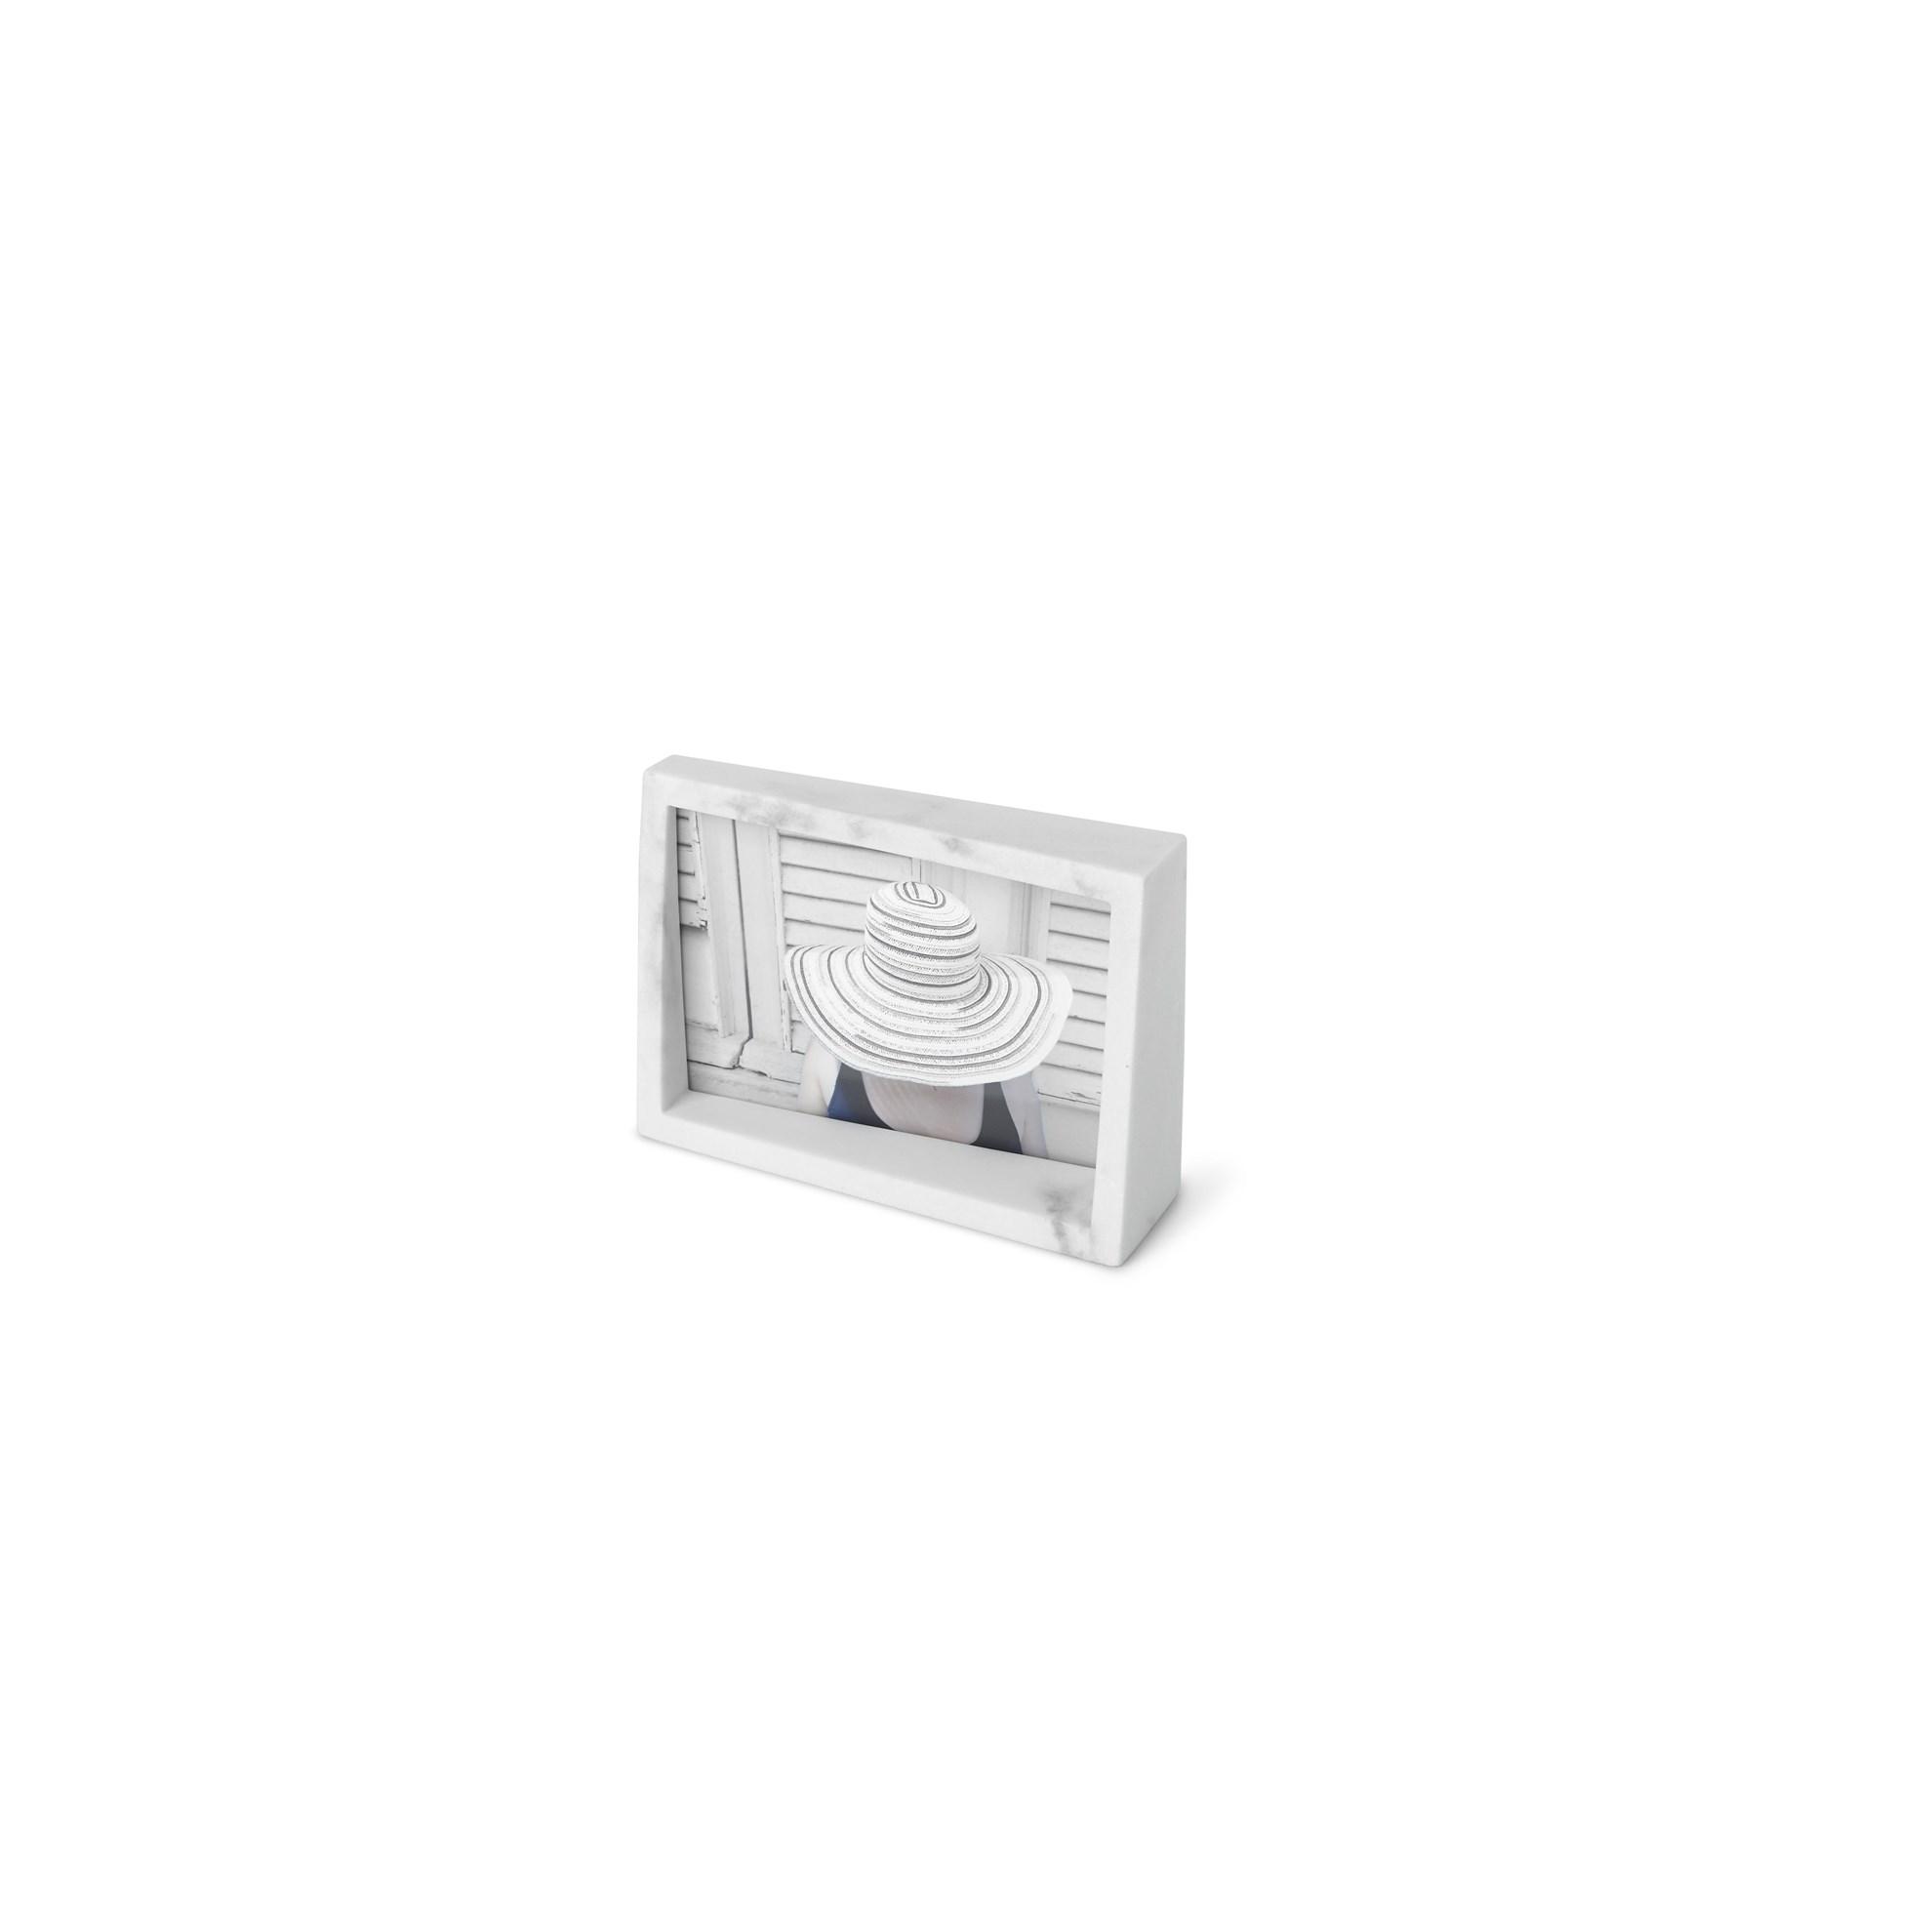 Fotorámeček EDGE MARBLE 10x15 bílý mramor_2